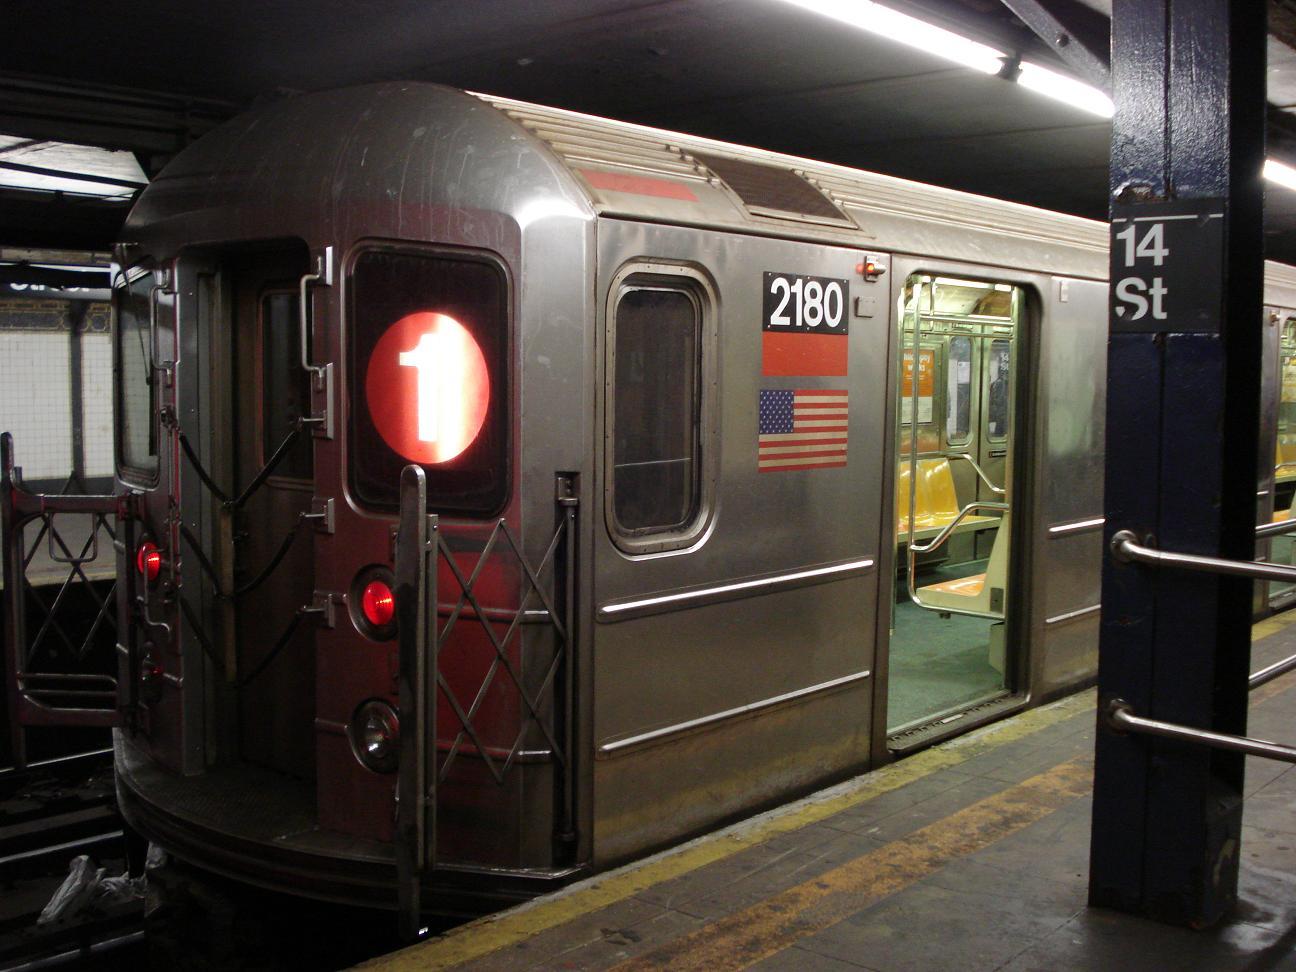 (163k, 1296x972)<br><b>Country:</b> United States<br><b>City:</b> New York<br><b>System:</b> New York City Transit<br><b>Line:</b> IRT West Side Line<br><b>Location:</b> 14th Street<br><b>Route:</b> 1<br><b>Car:</b> R-62A (Bombardier, 1984-1987) 2180 <br><b>Photo by:</b> Michael Hodurski<br><b>Date:</b> 2/17/2007<br><b>Viewed (this week/total):</b> 1 / 3642